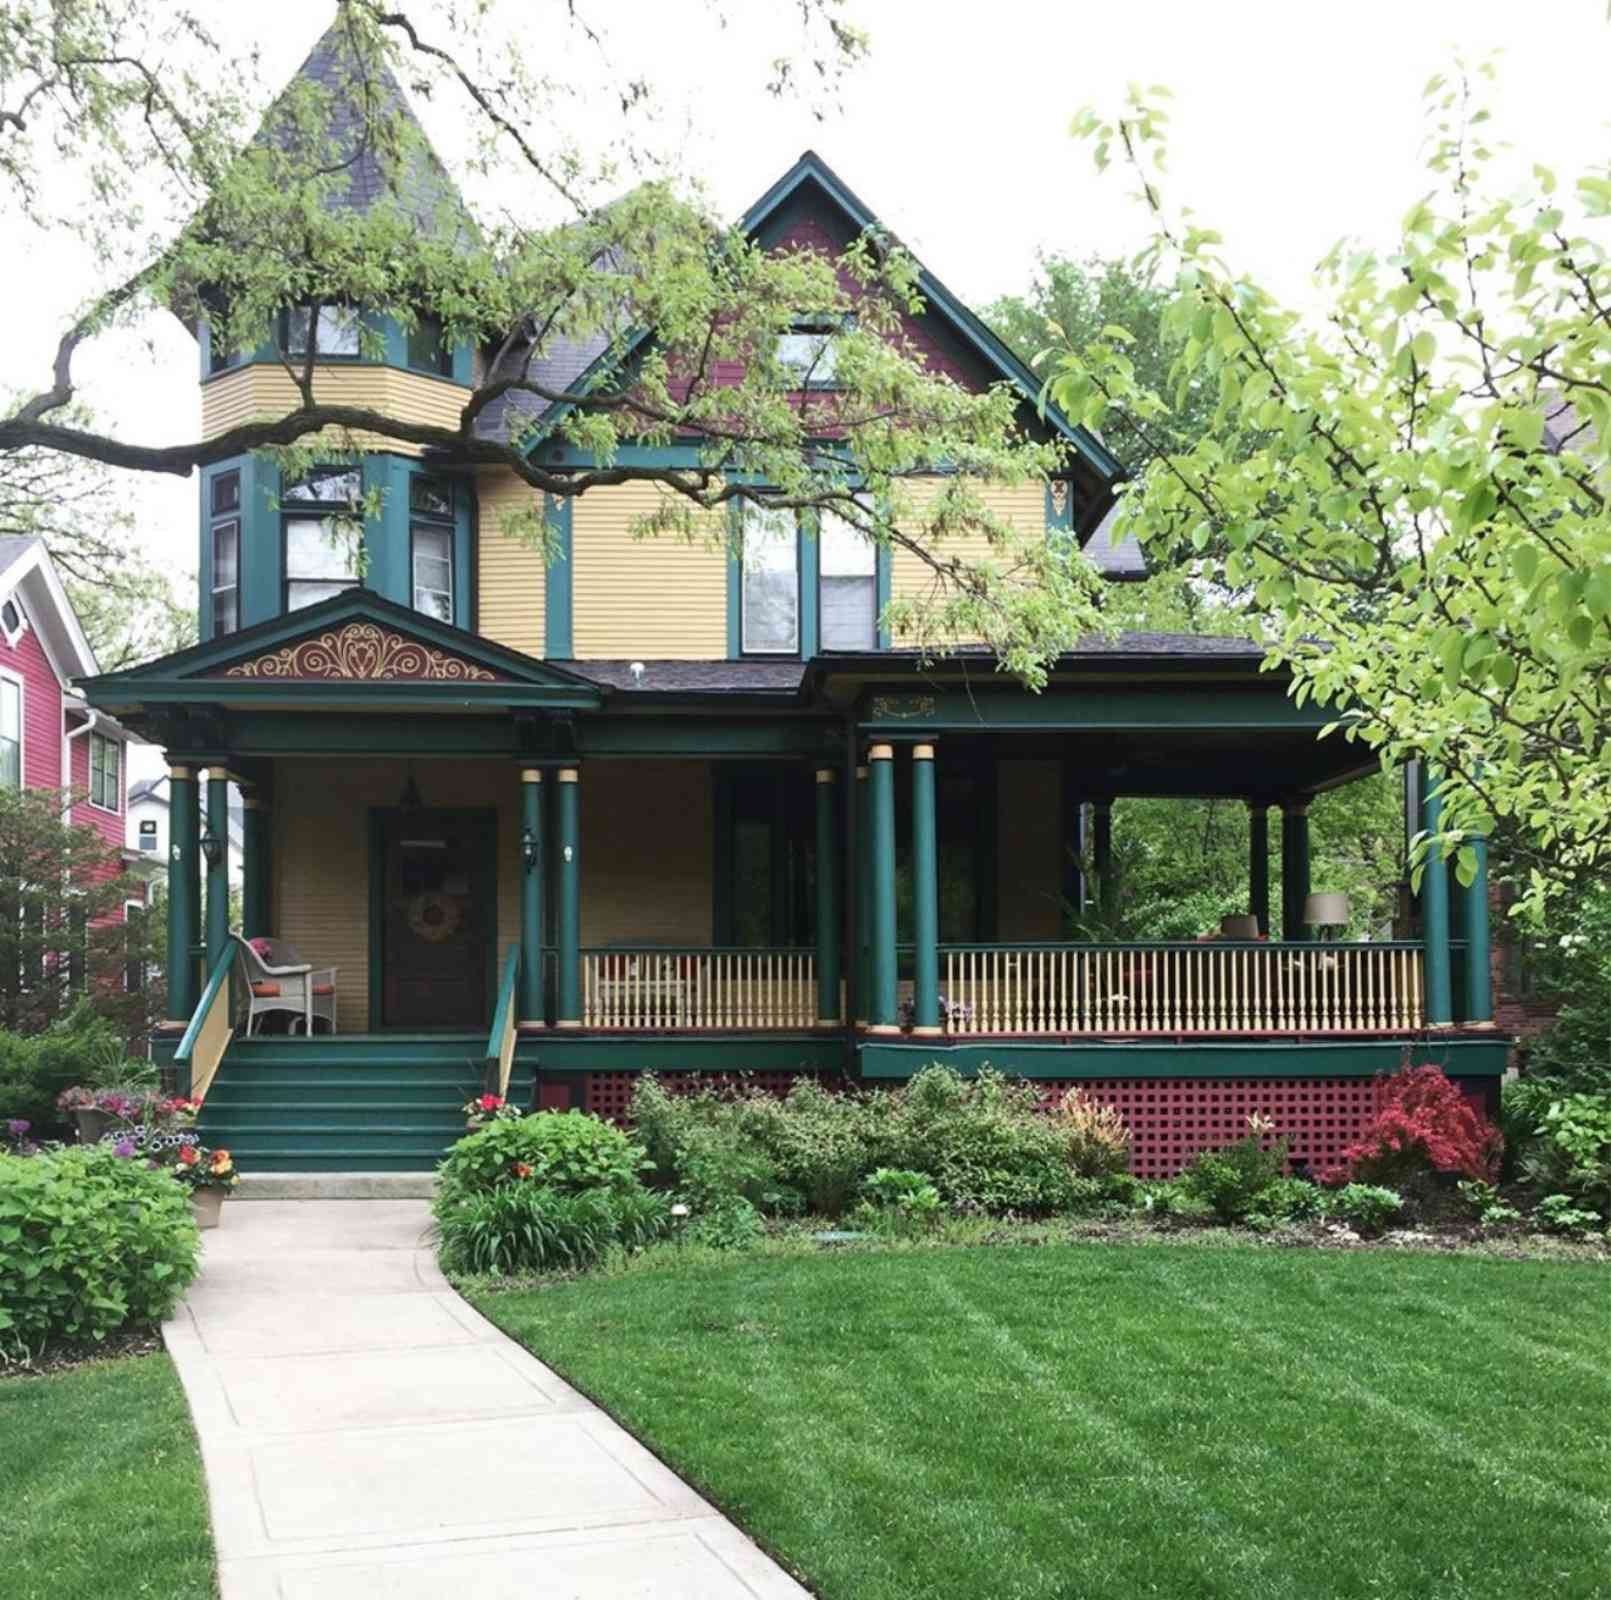 Casa victoriana Oak Park